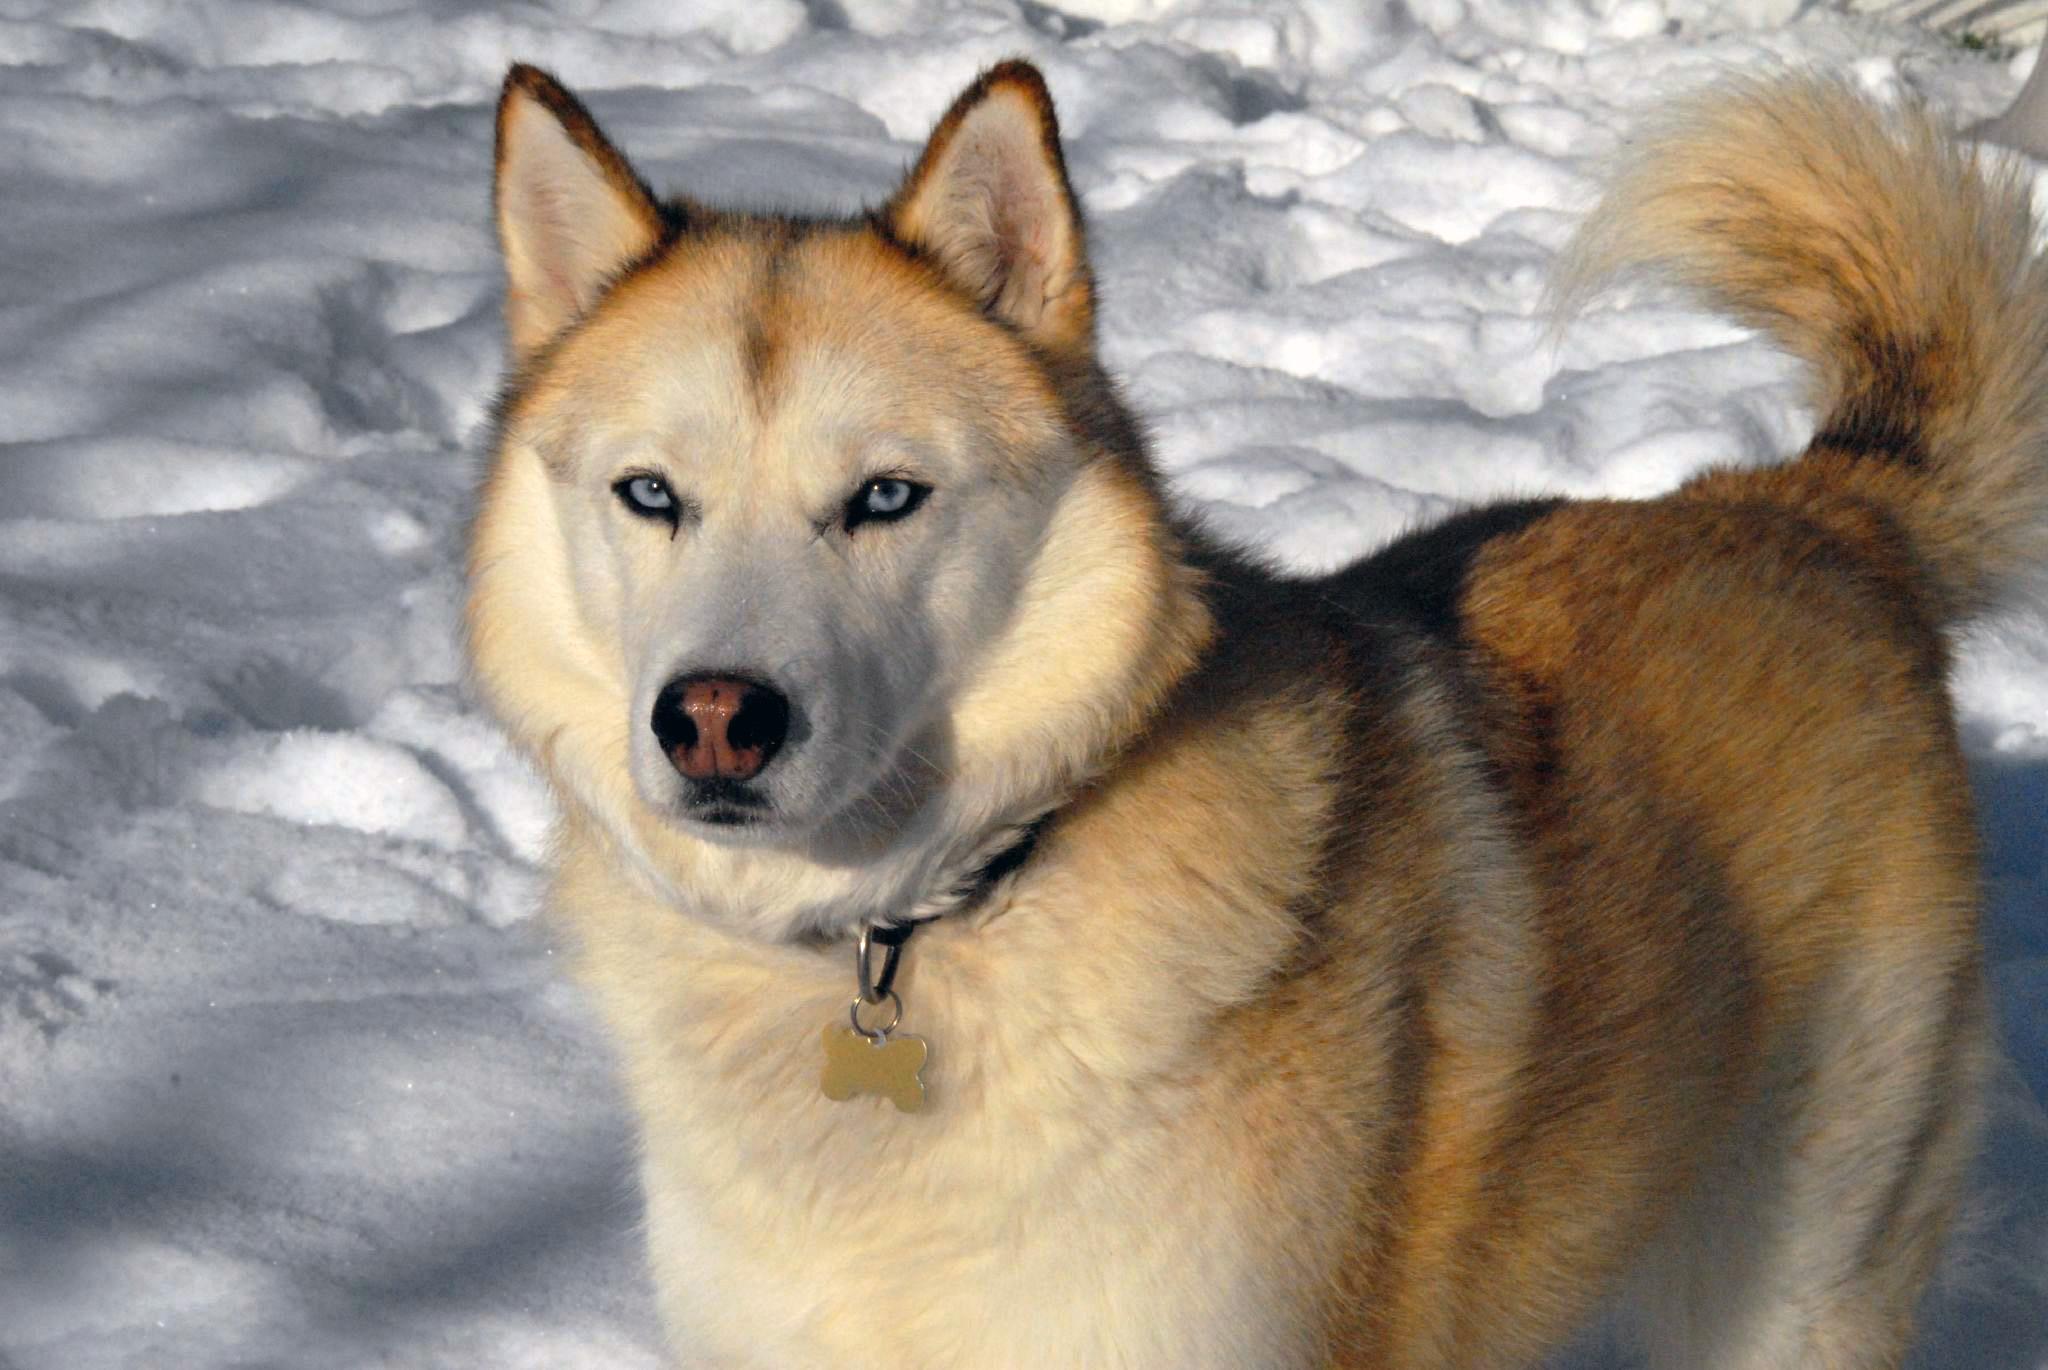 Perros Husky Siberiano Fondos De Pantalla Hd De Animales 2: Siberian Husky Full HD Fondo De Pantalla And Fondo De